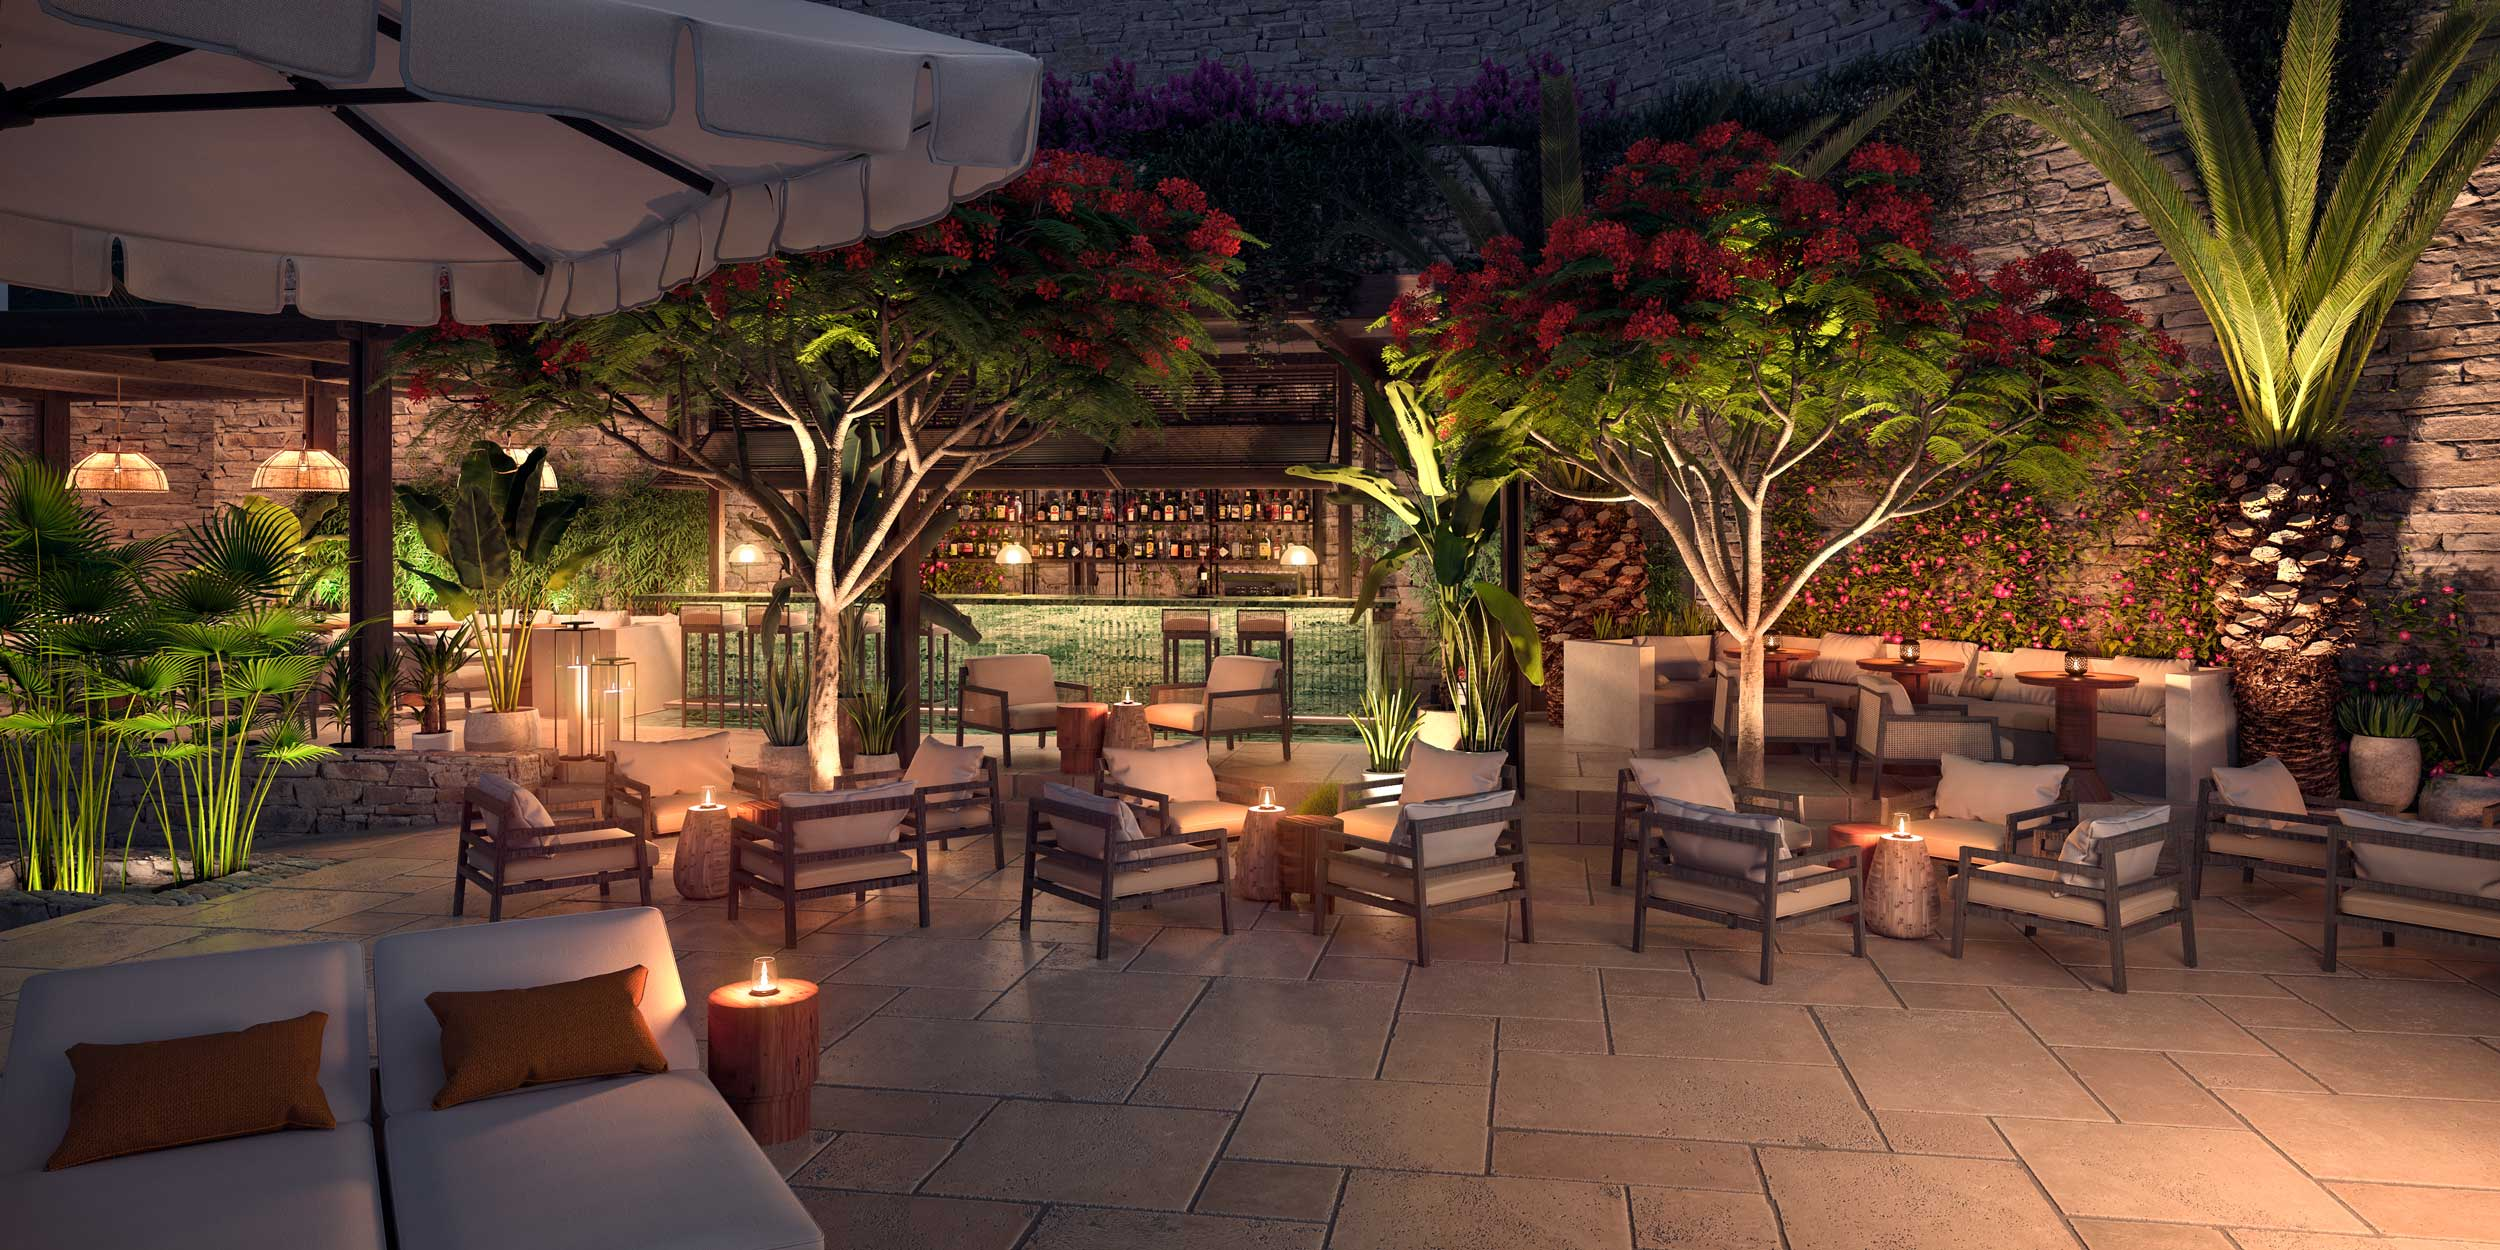 renders-nocturnos-terrazas-restaurantes